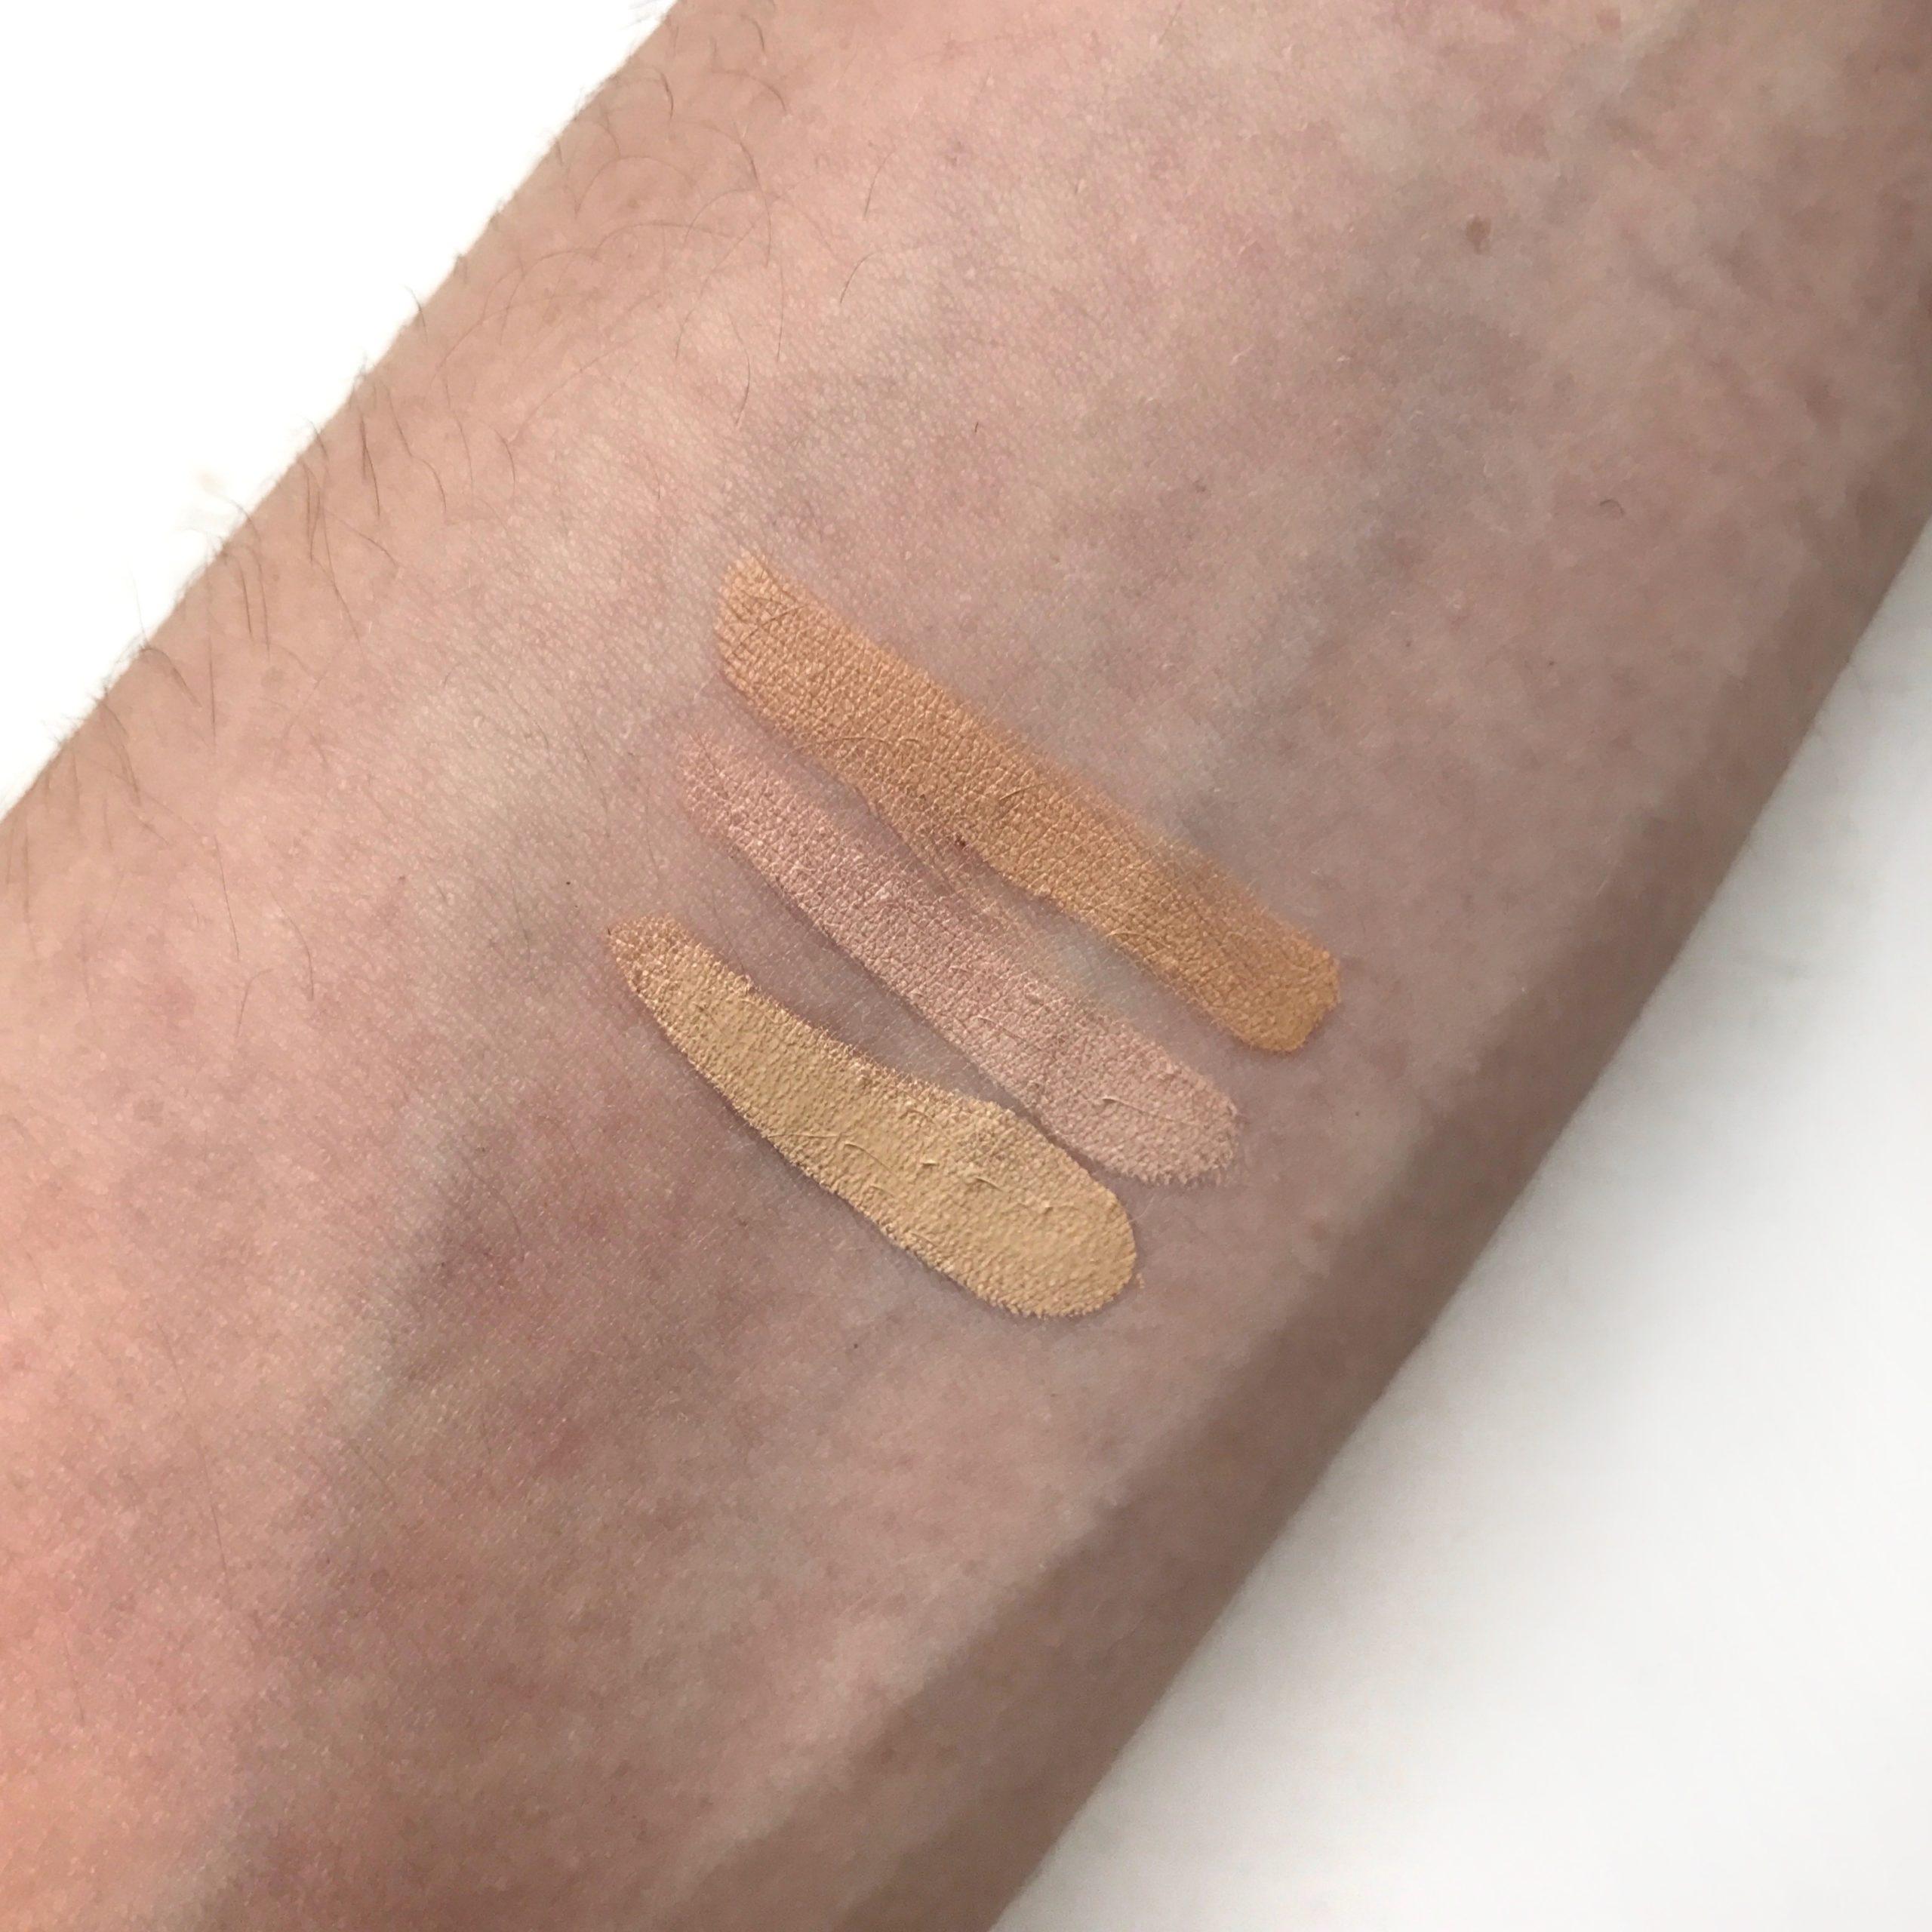 Swatch de 3 teintes du fond de teint Gressa Skin Minimalist Foundation